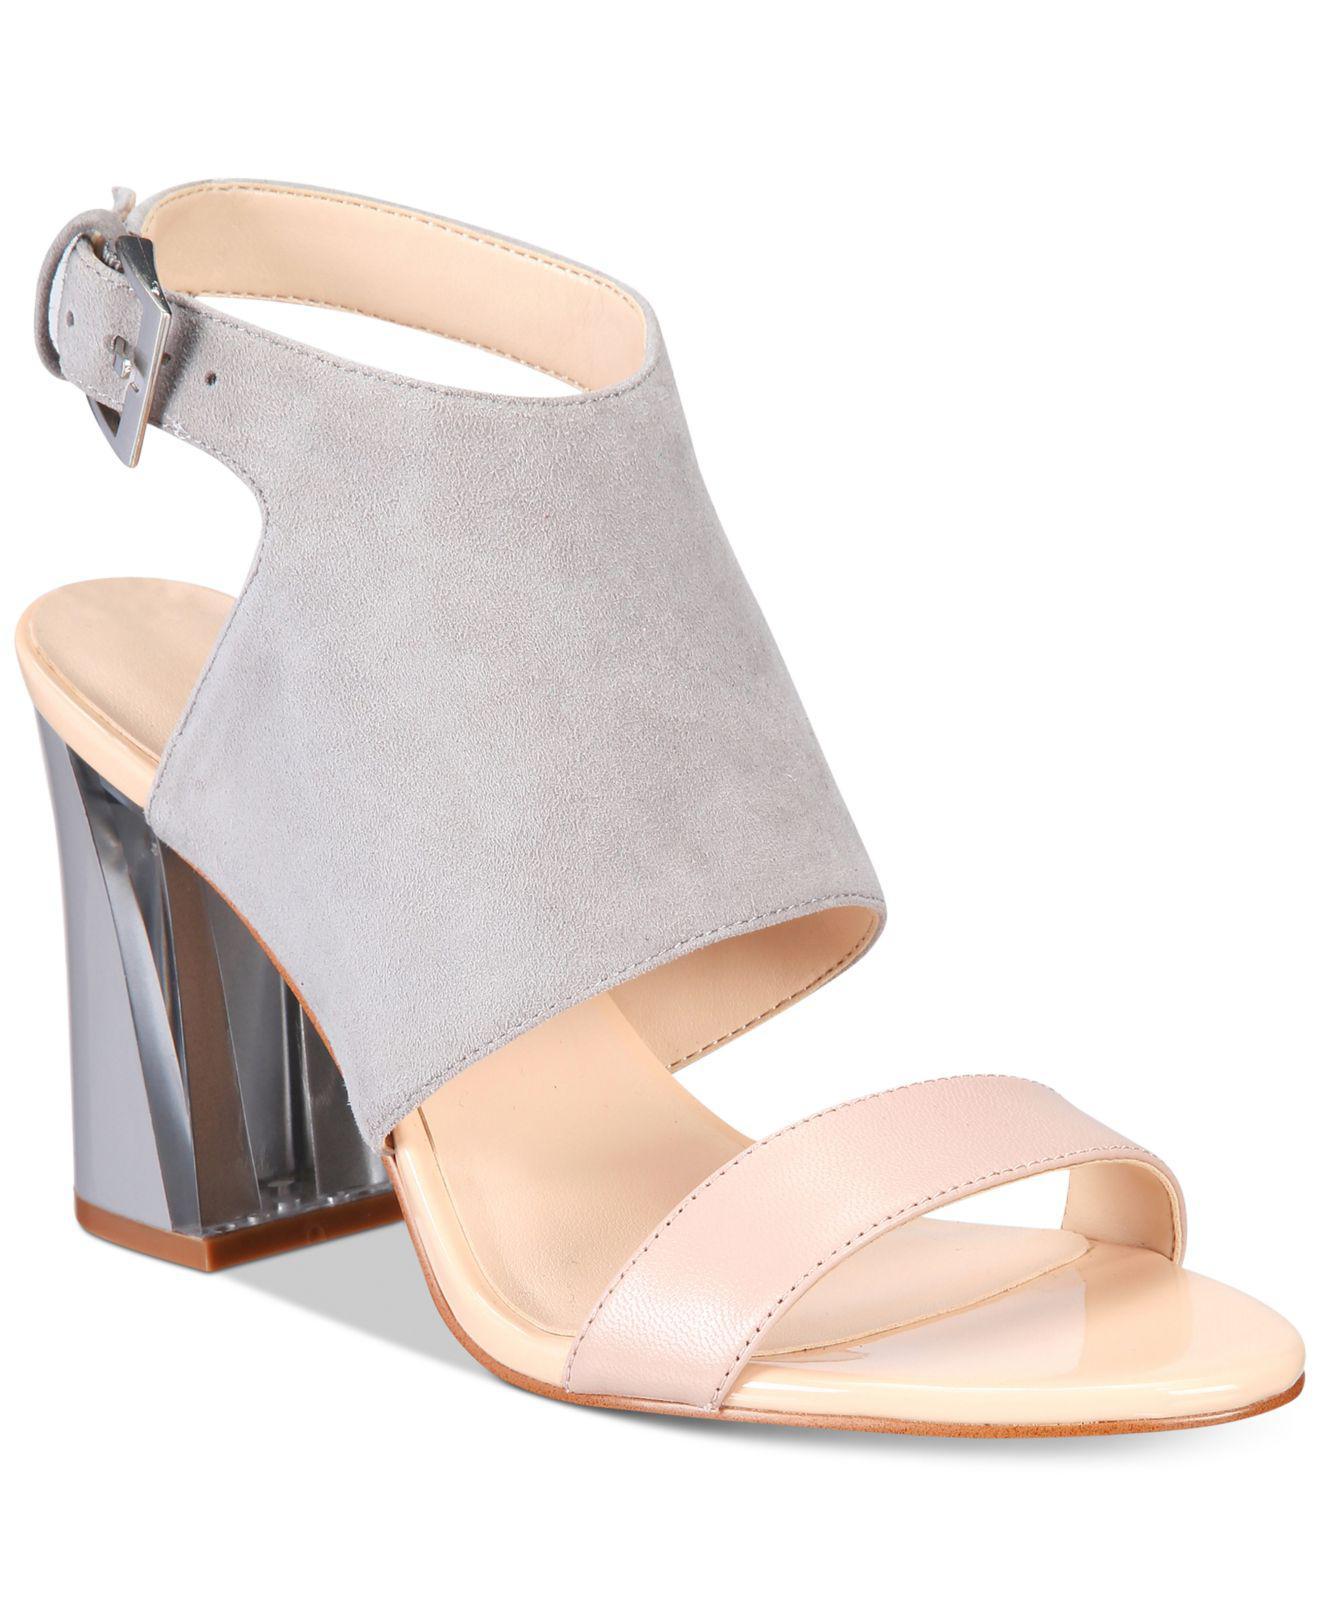 2acd0e4ac69 Lyst - Nine West Moshpit Block-heel Sandals